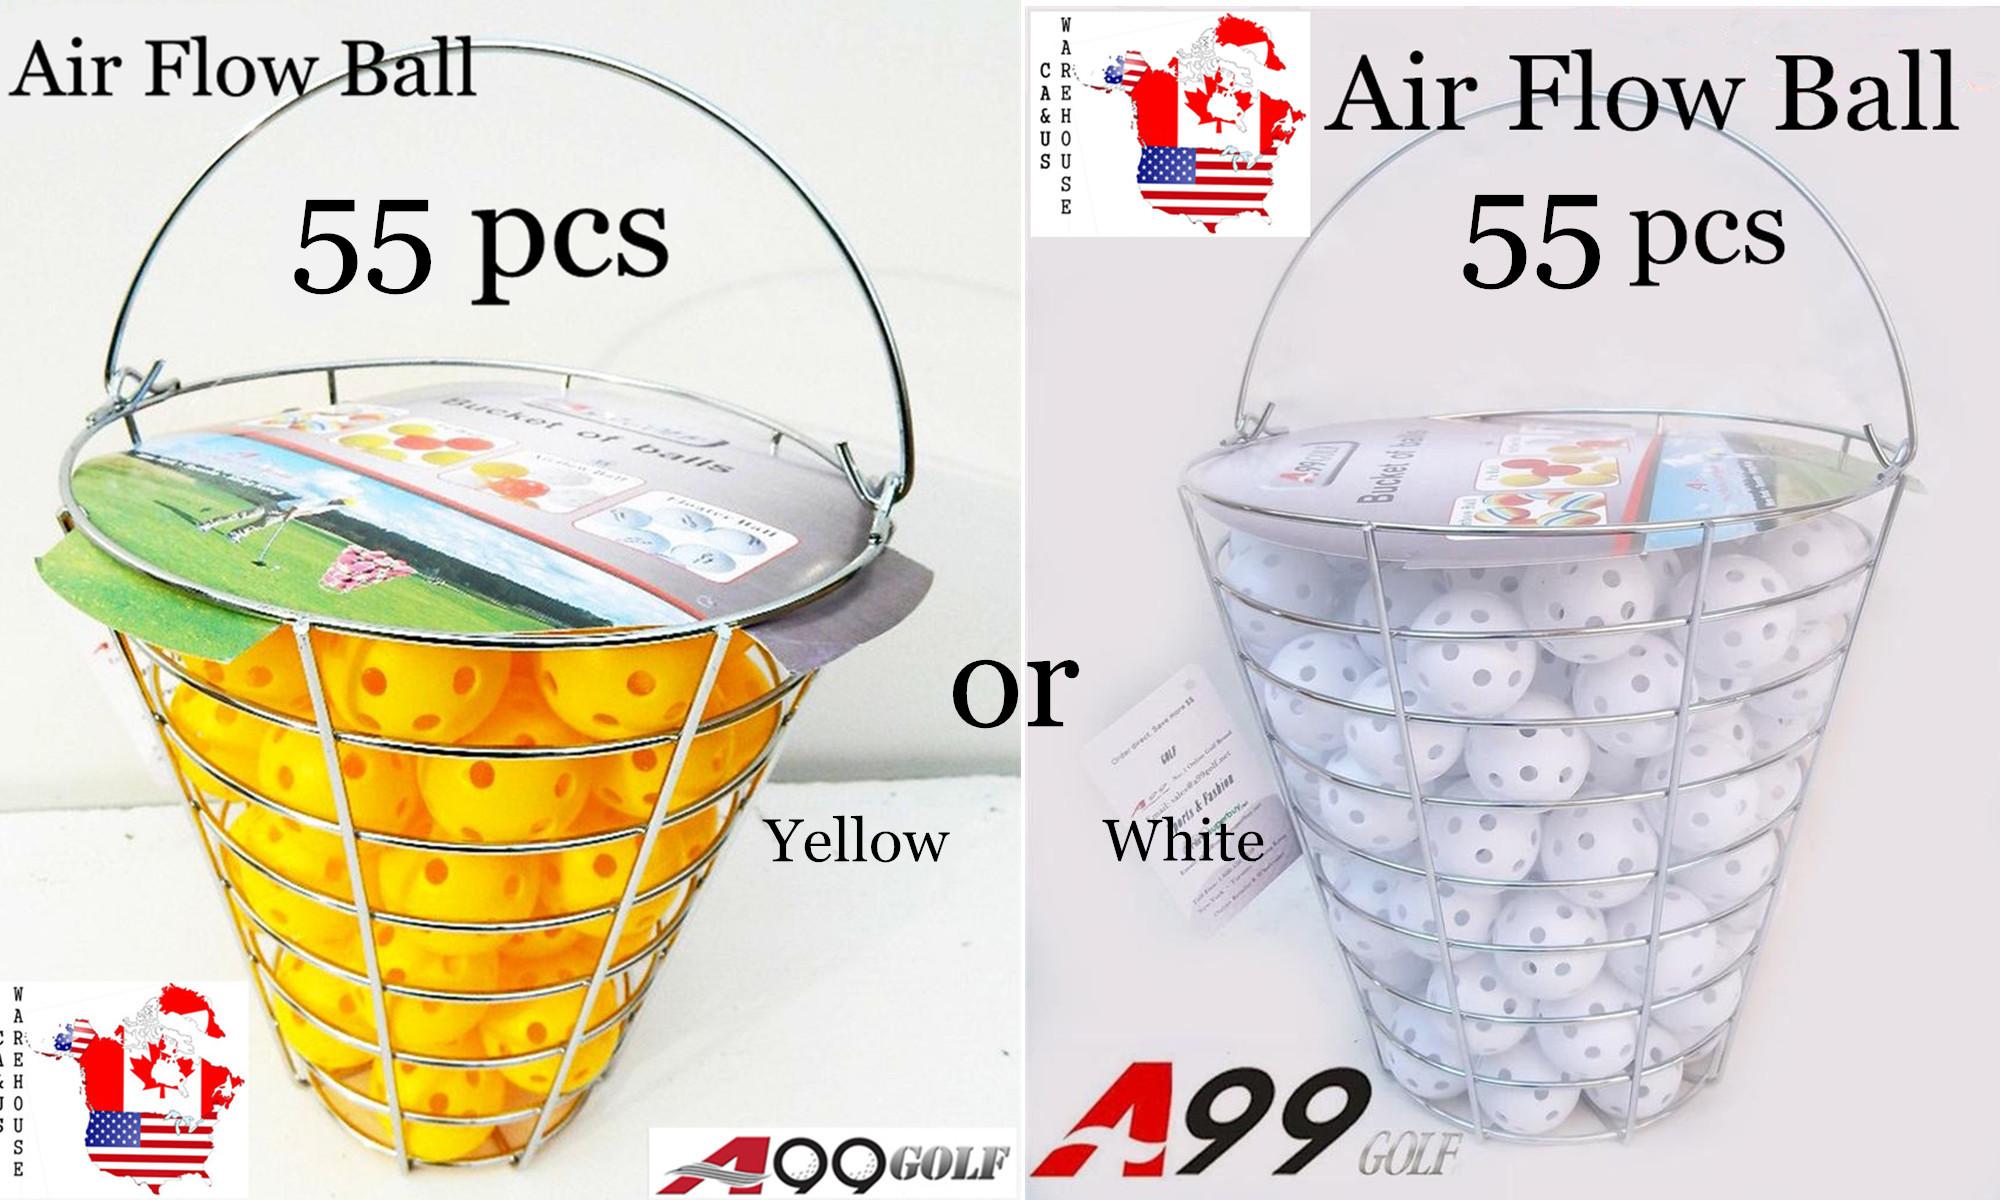 55-with-bucket_------_------.jpg